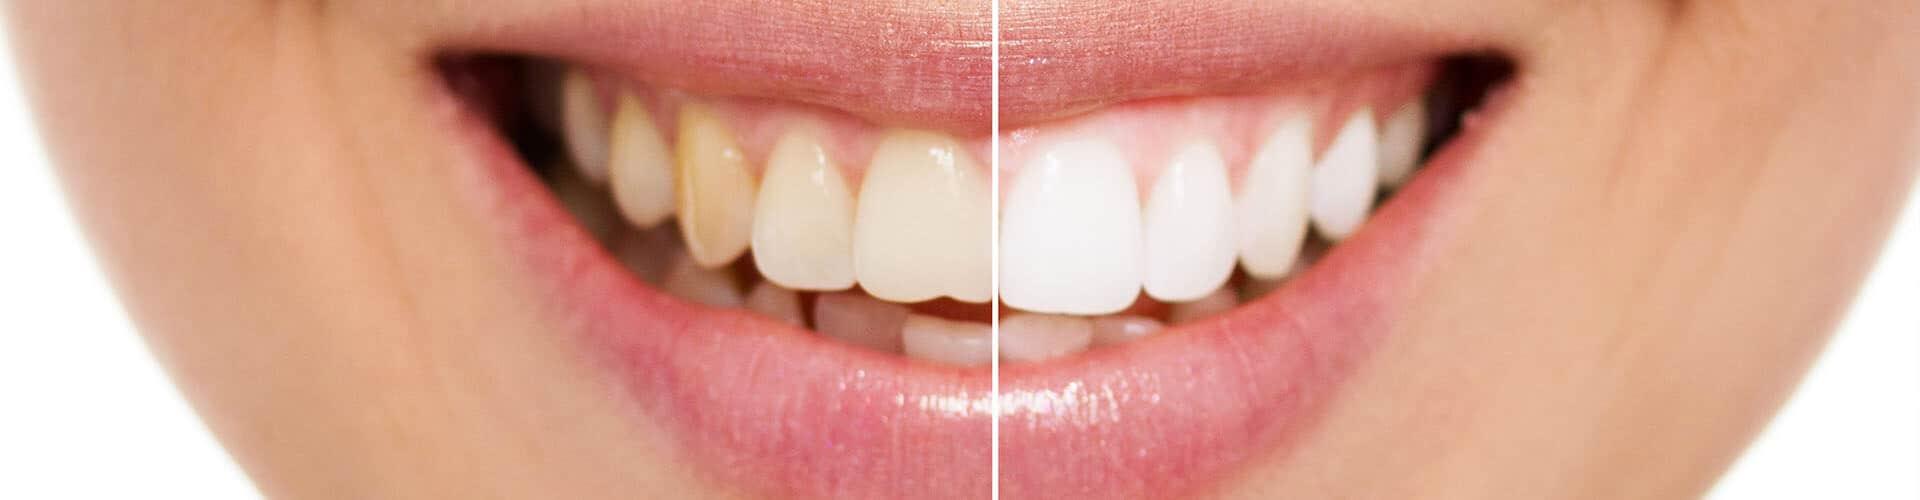 branqueamento dentario, branqueamento dentes, dentes brancos